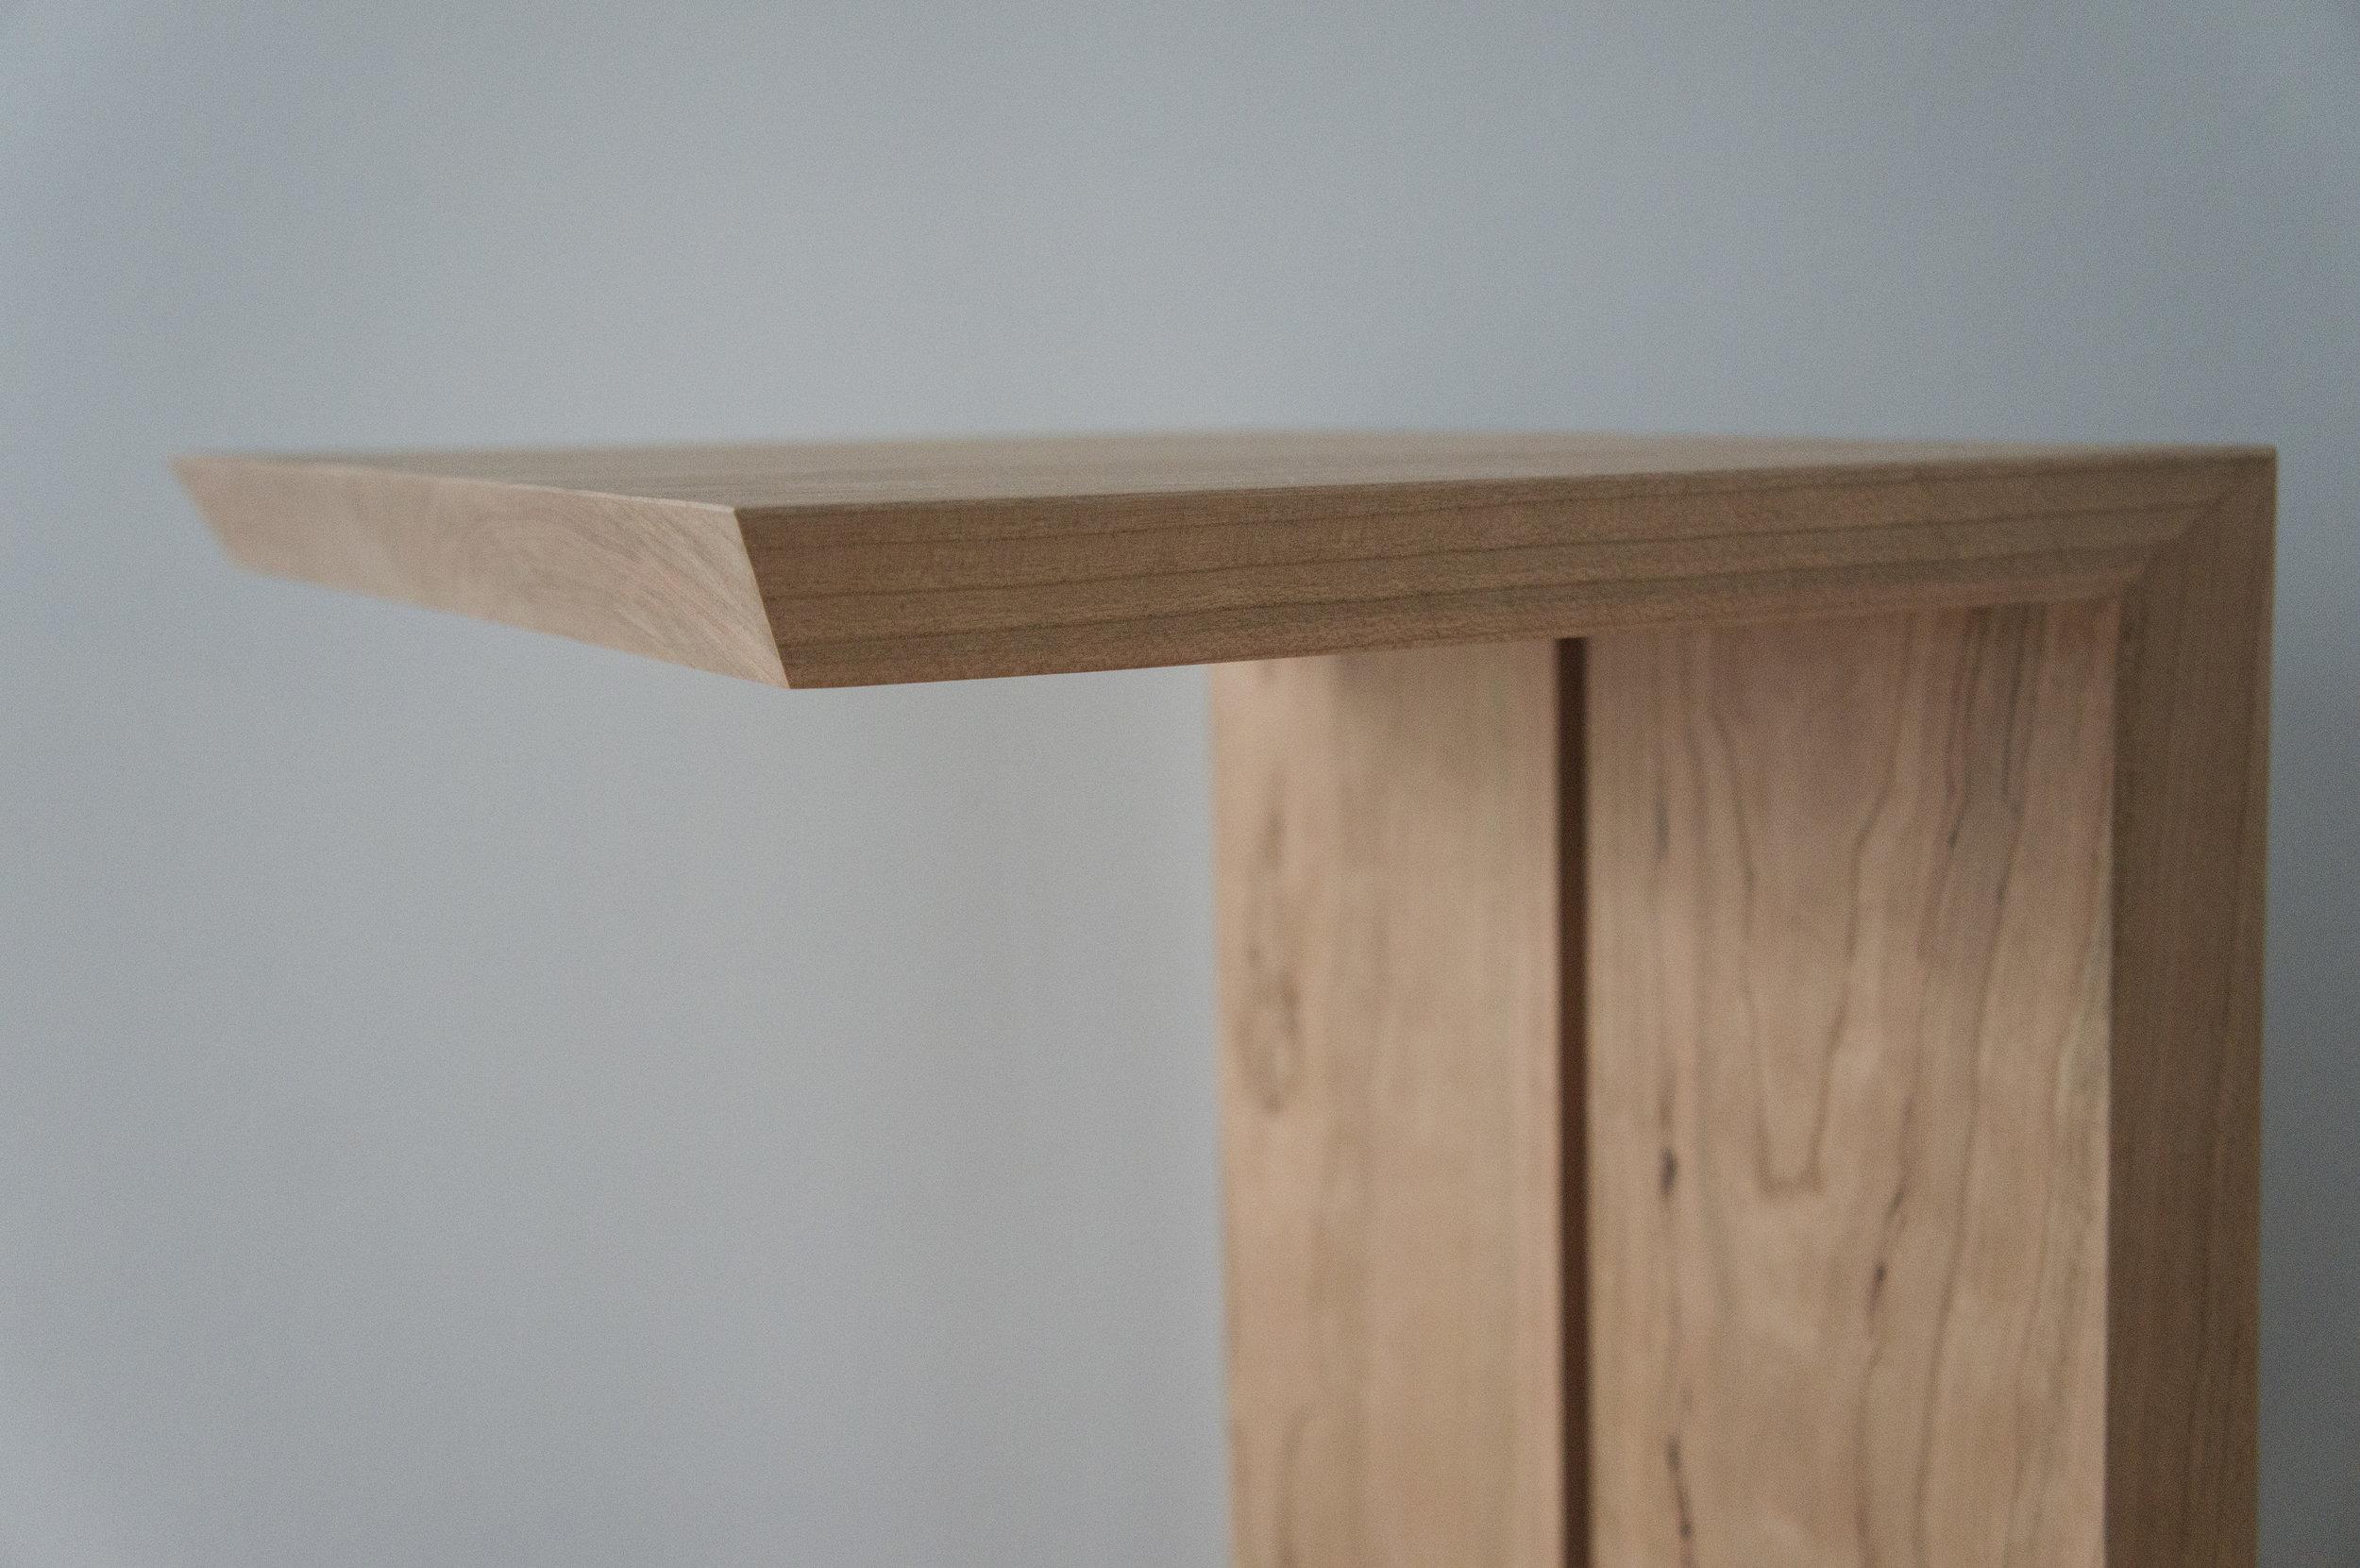 Euclid table_SONY NEX_close up front corner.jpg